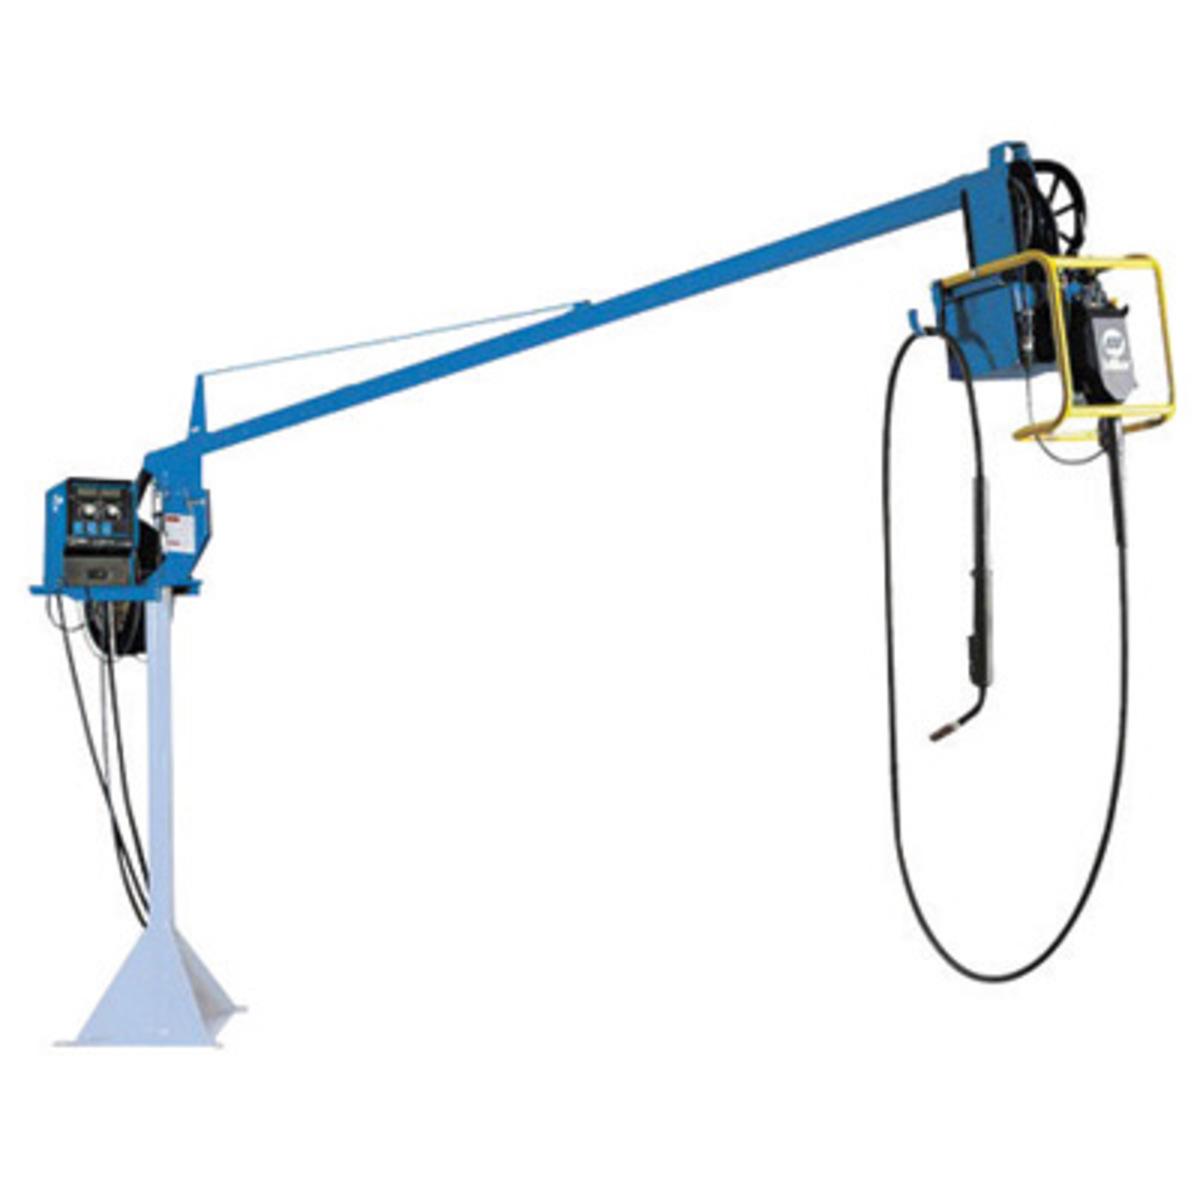 Airgas - MIL951437 - Miller® Swingarc™ CV Boom Mounted Single Wire ...